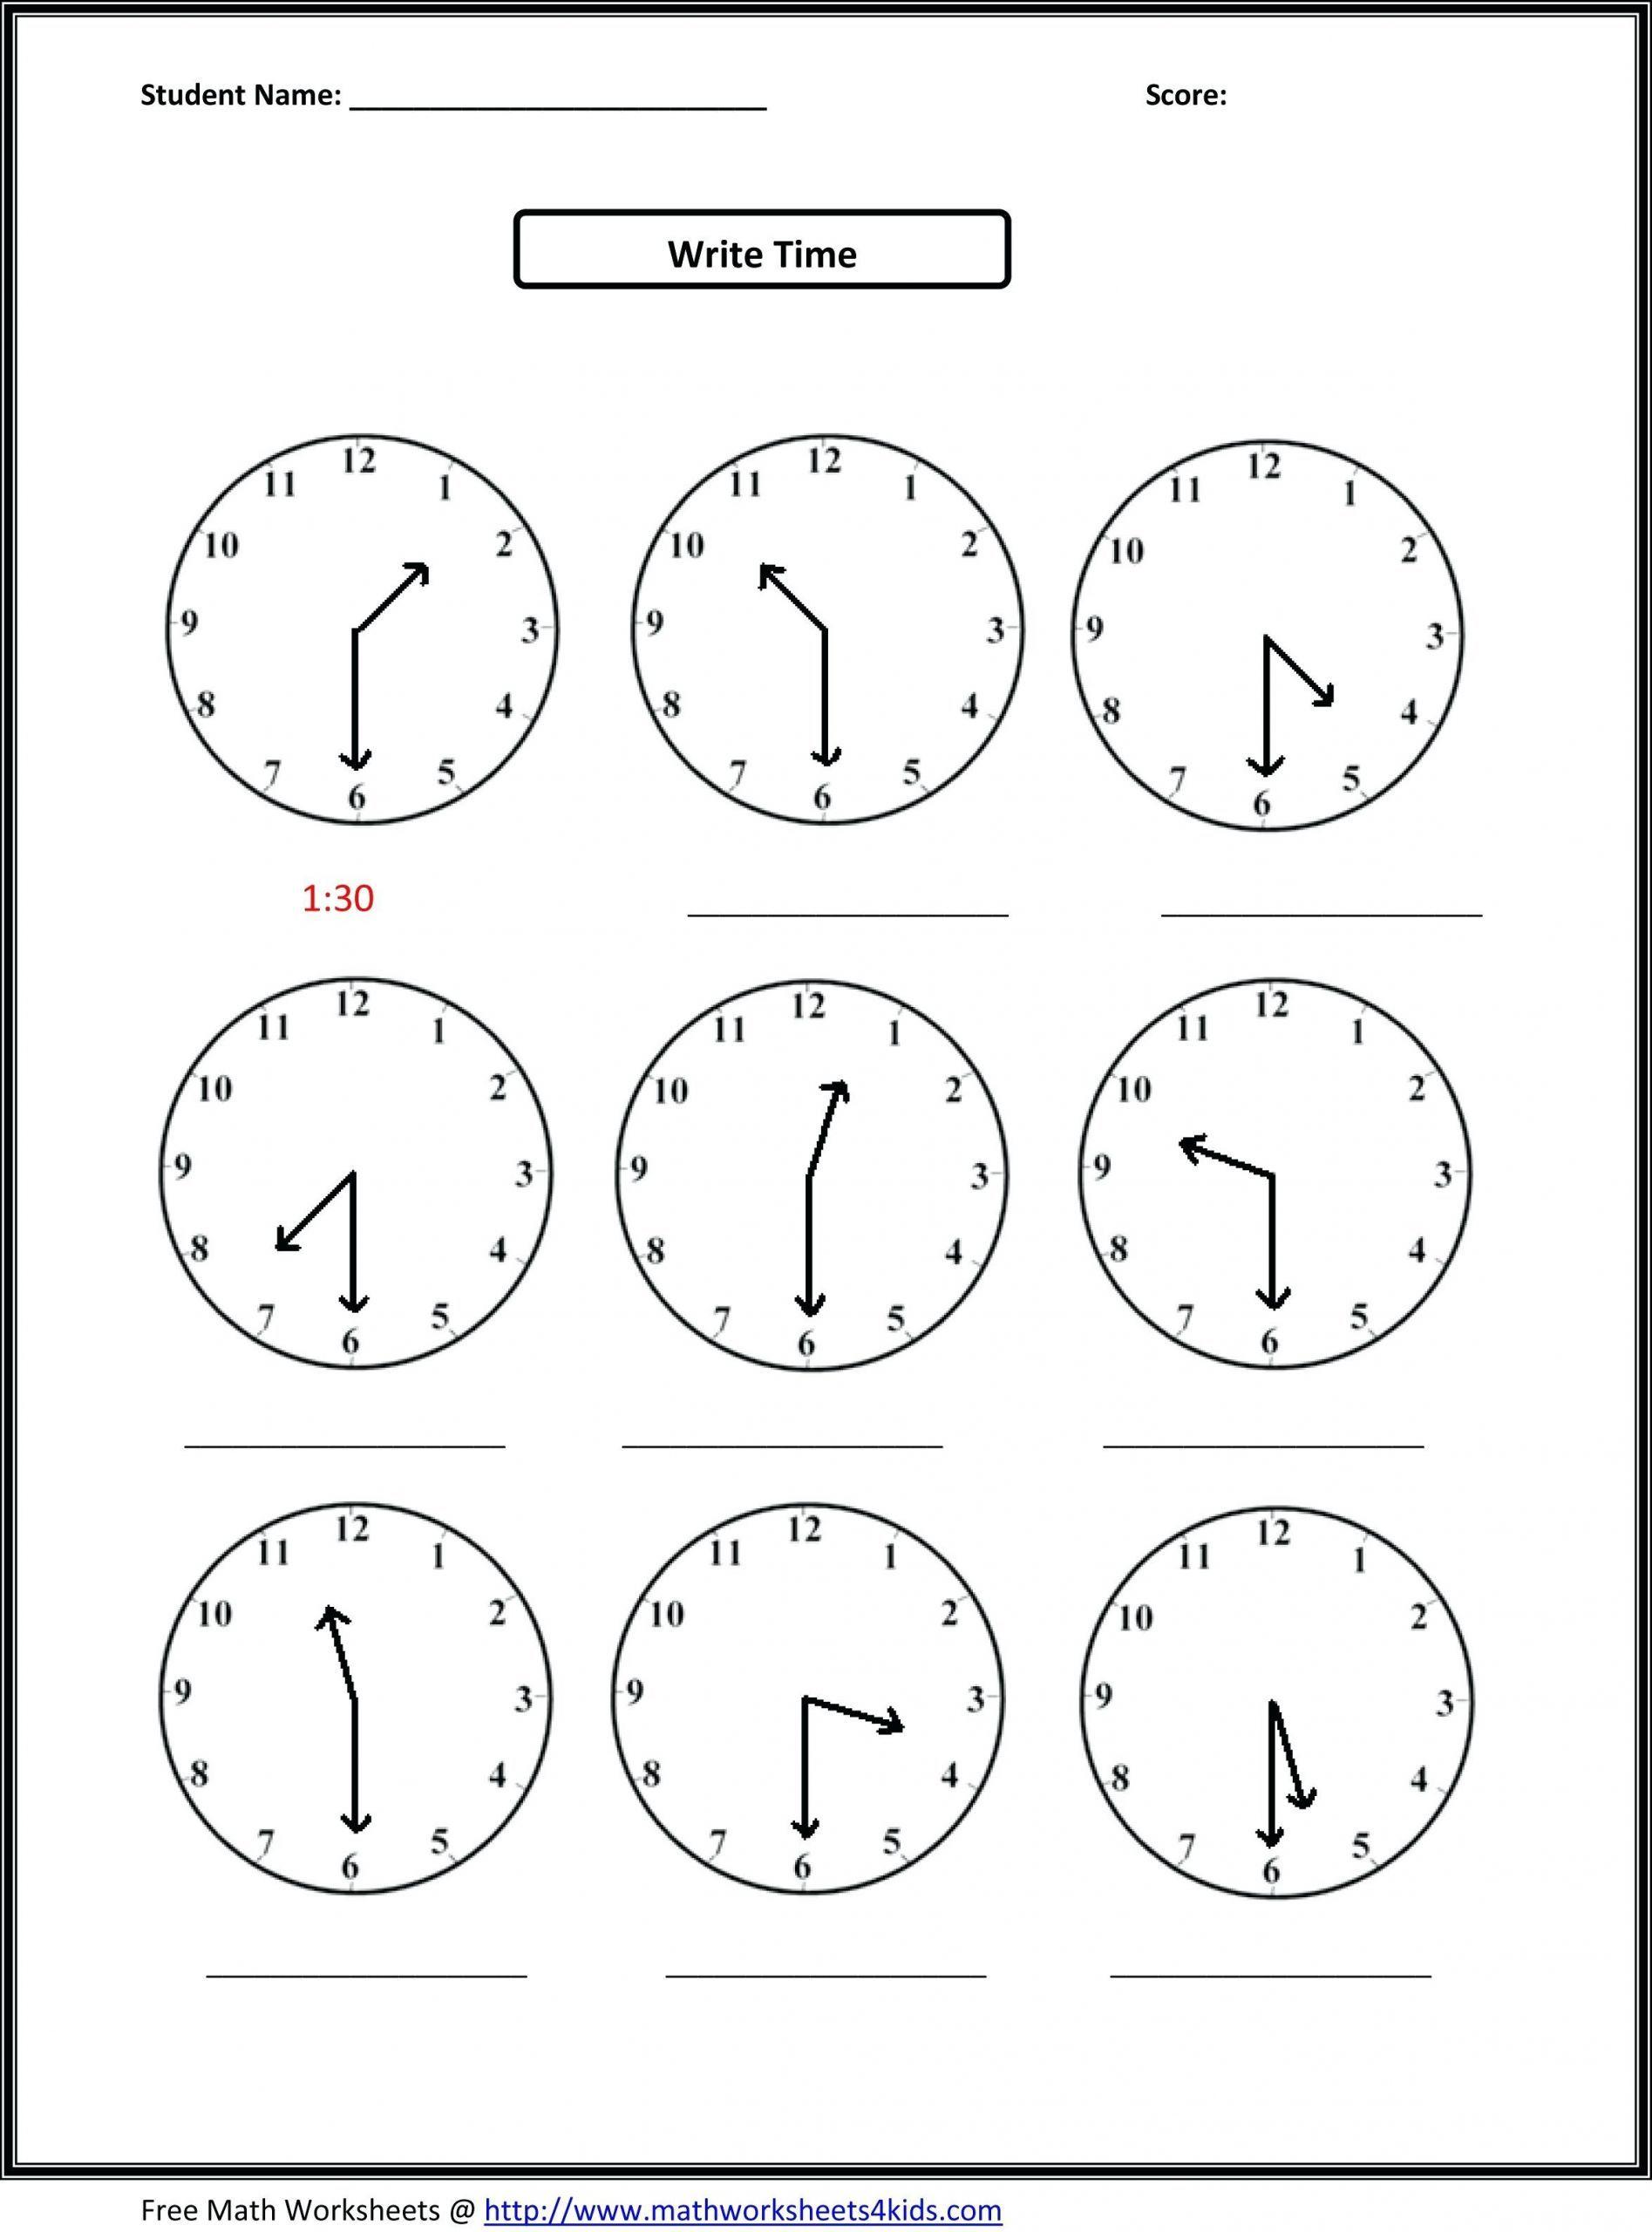 3 Free Math Worksheets First Grade 1 Number Charts Math